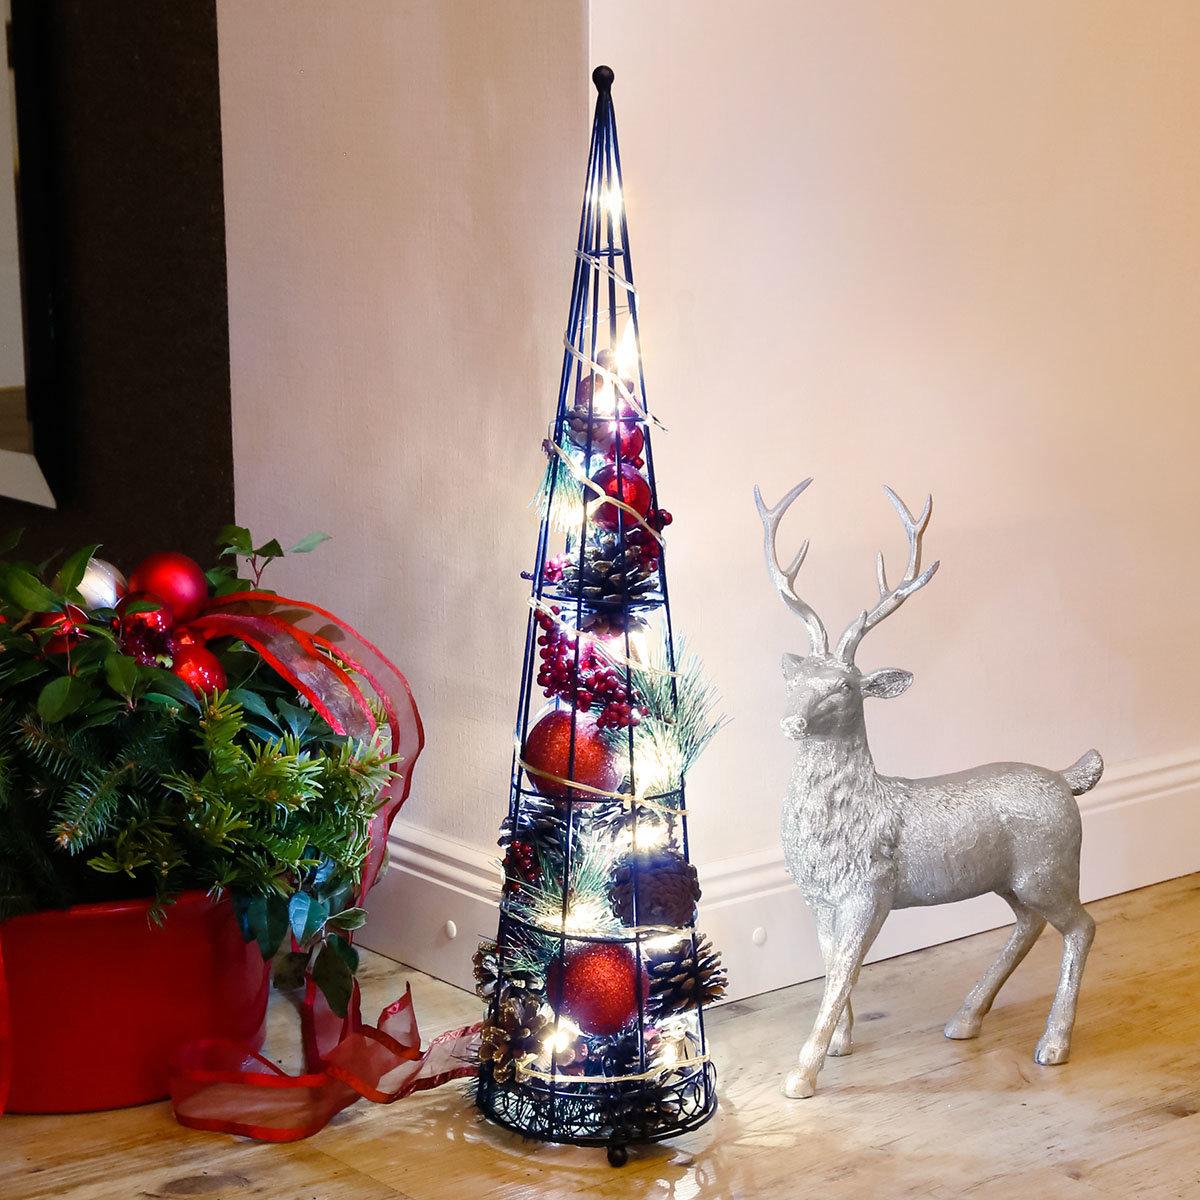 LED-Kegel Weihnachtszauber, groß | #2